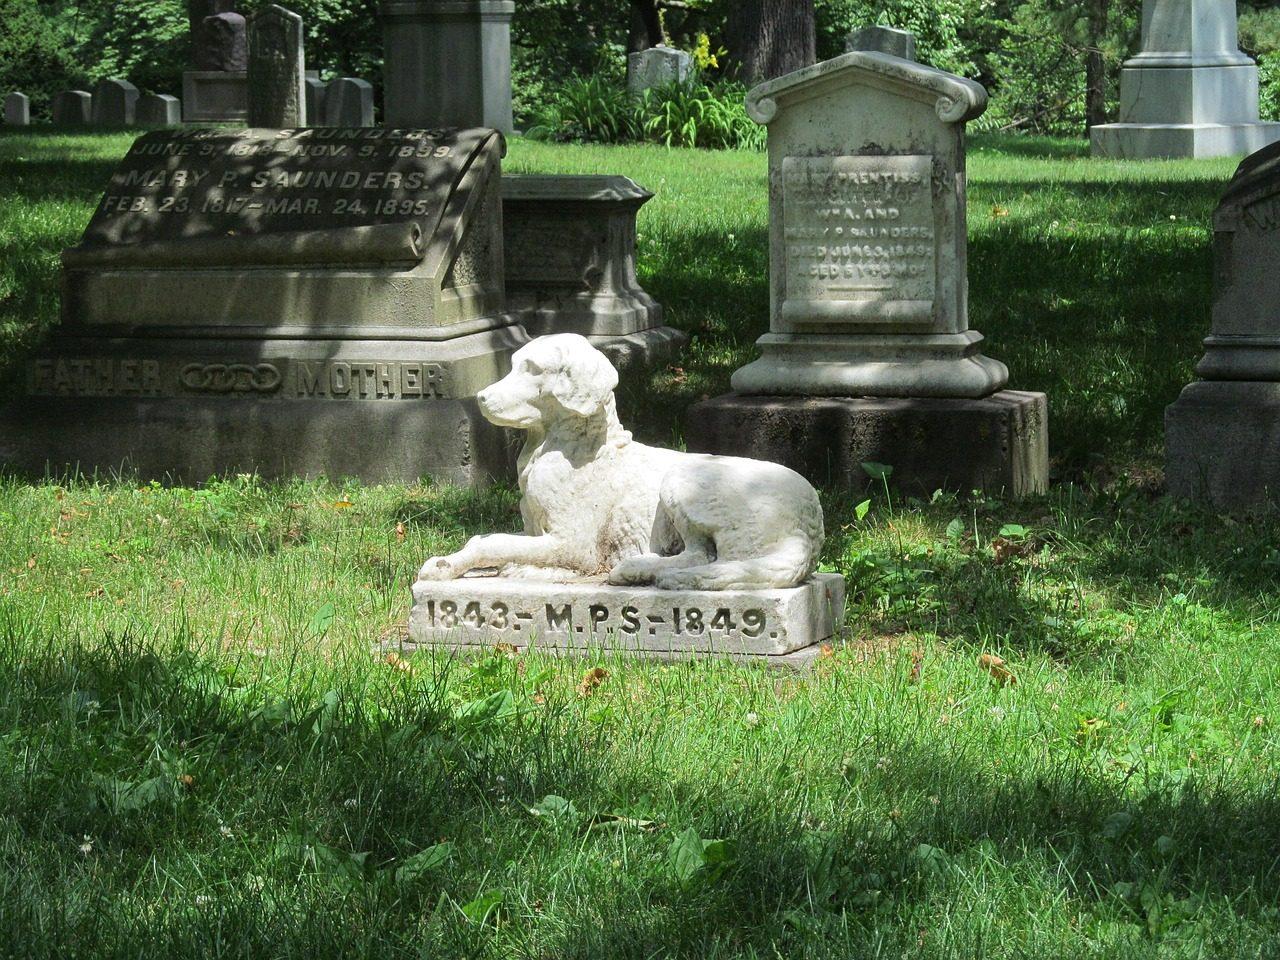 graveyard-438548_1280-1280x960.jpg